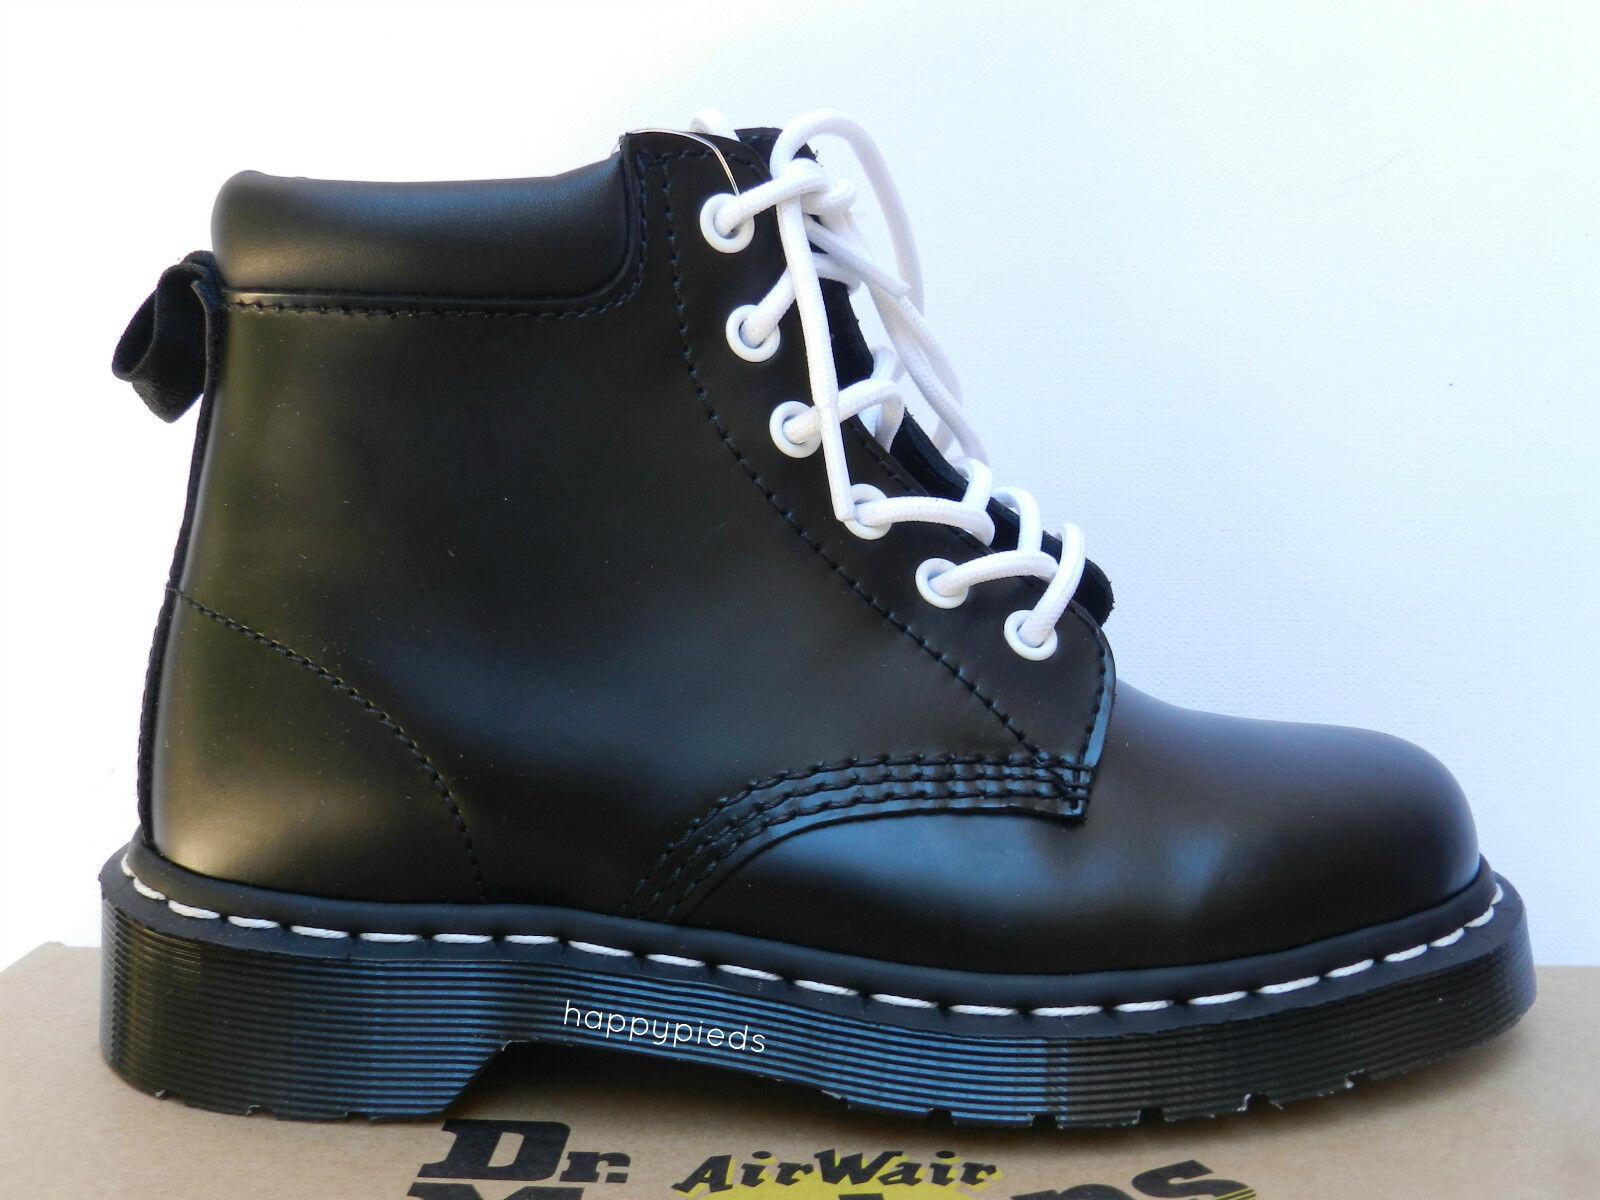 Dr Martens 939 Chaussures 36 Bottes Bottines Unisexe Ben démarrage 16754001 UK3 Neuf